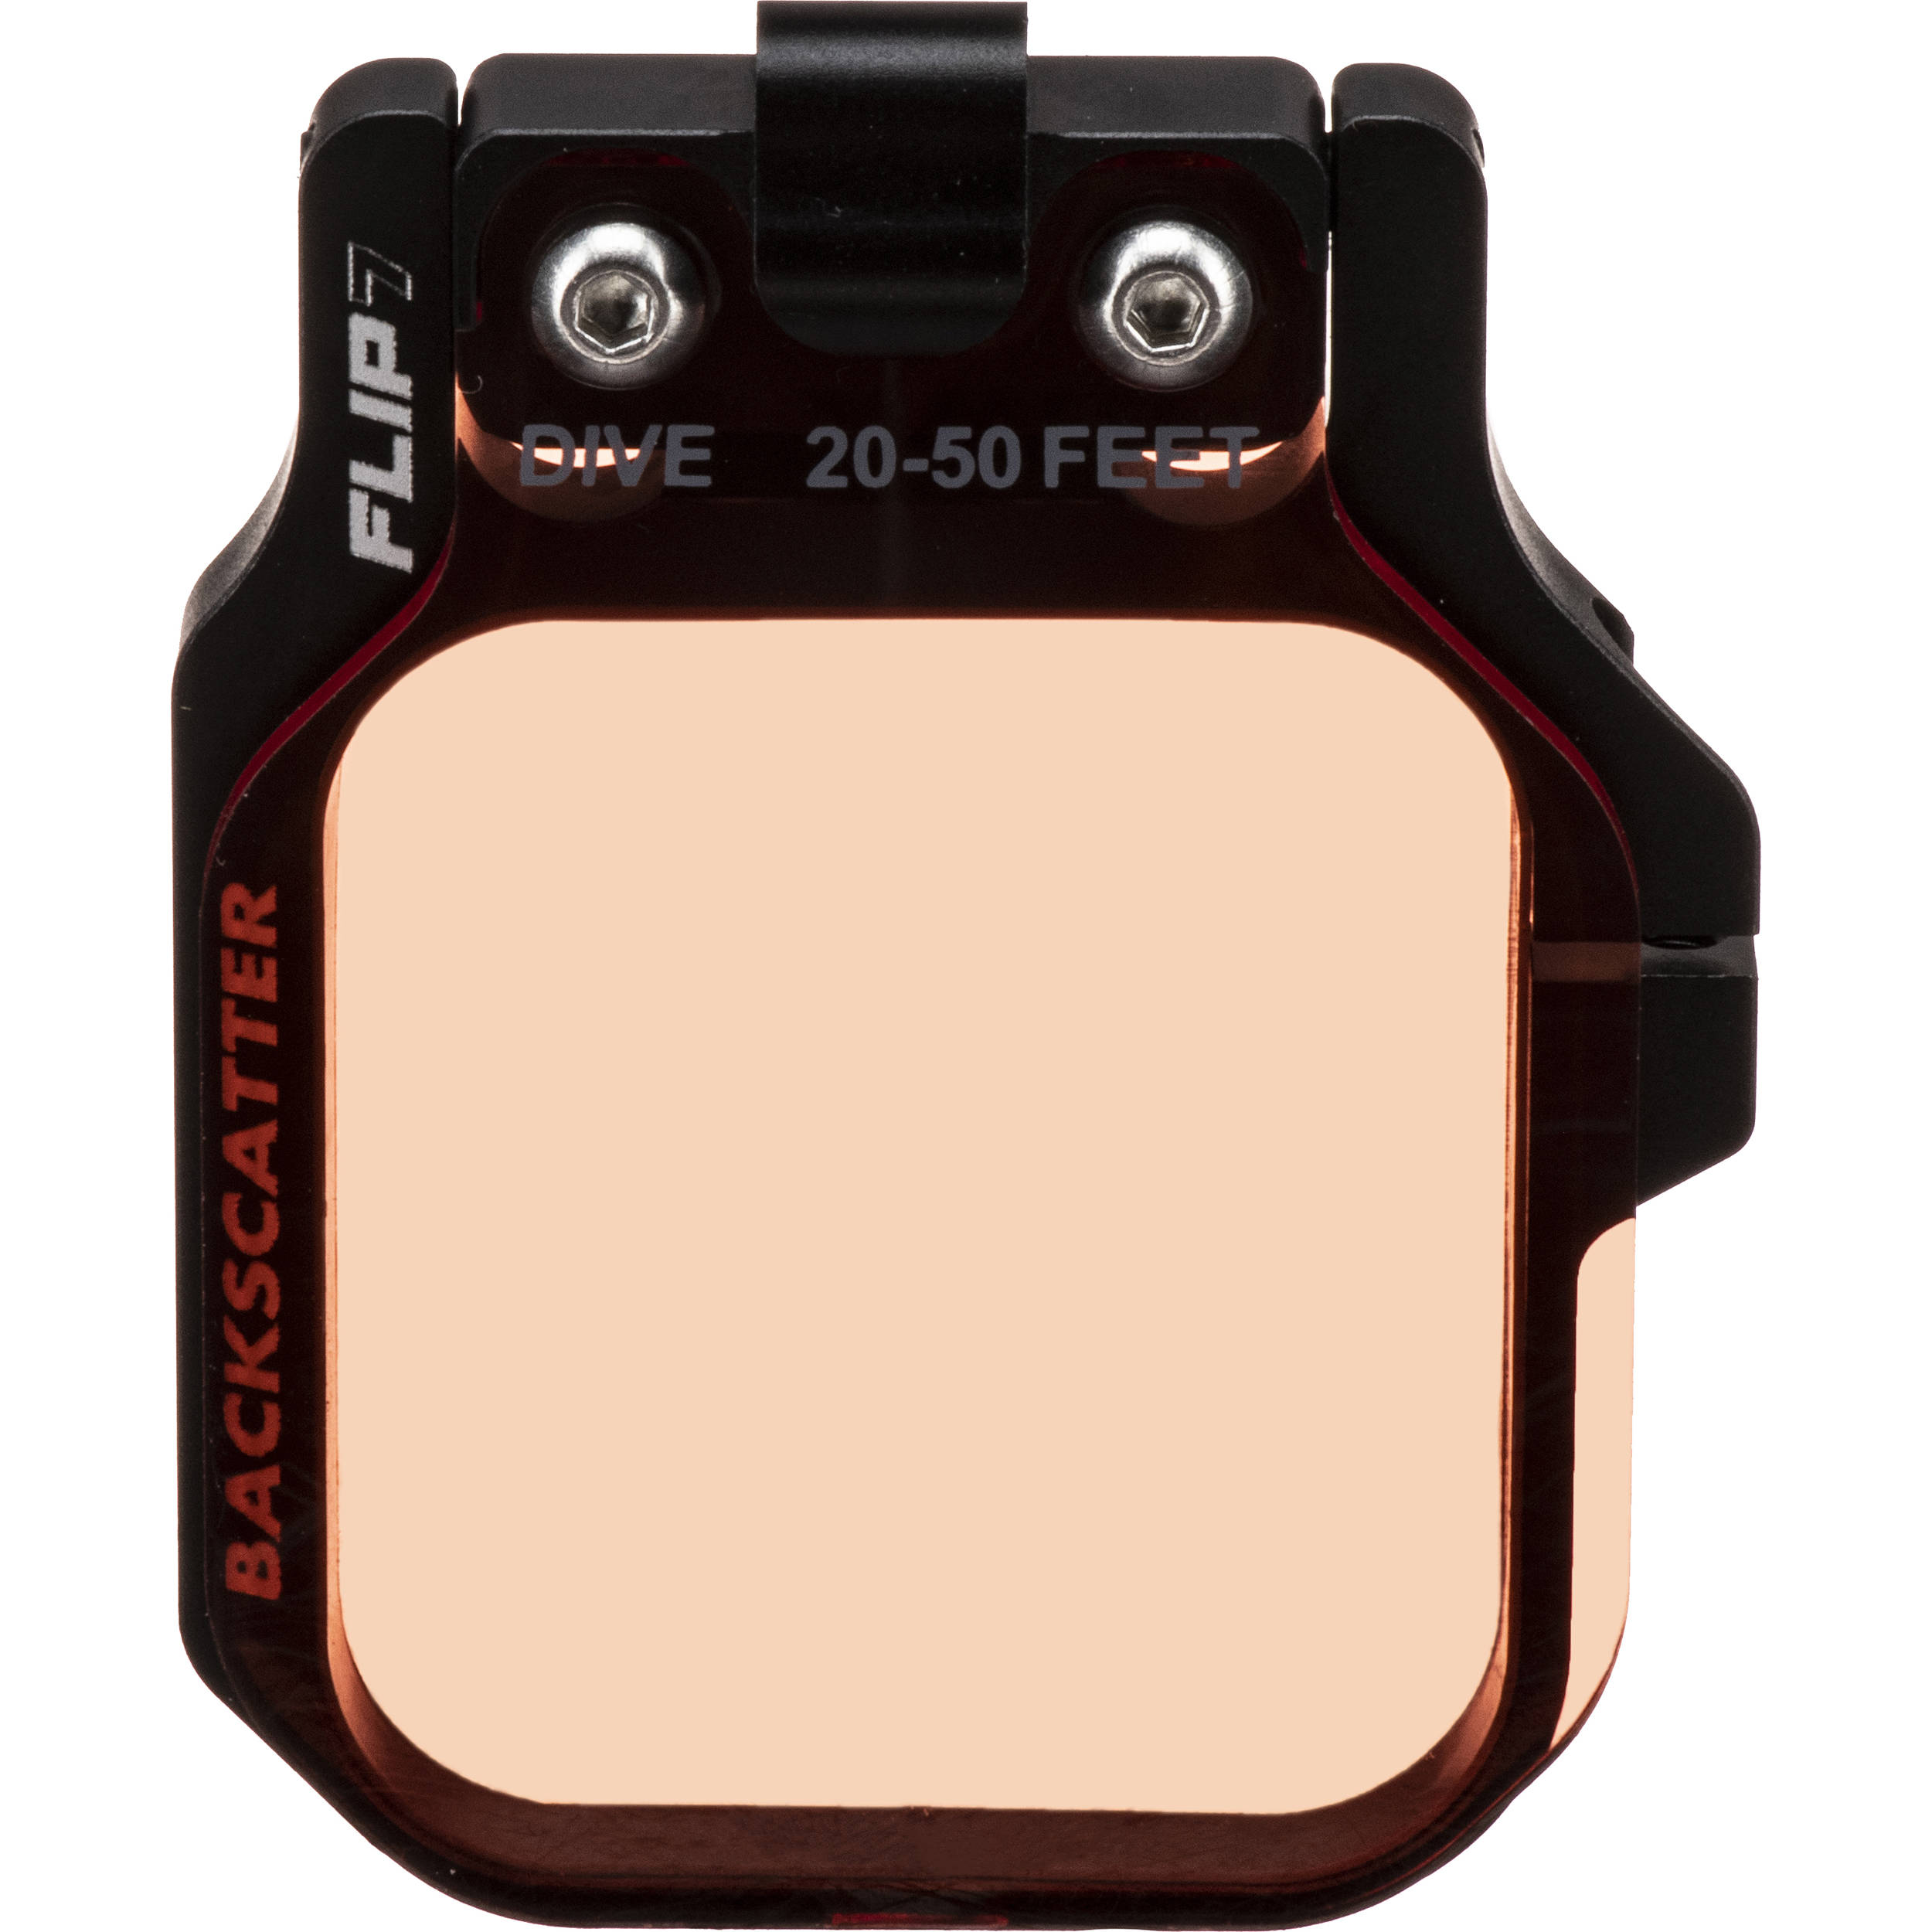 Backscatter flip 7 single kit con dive-Filter